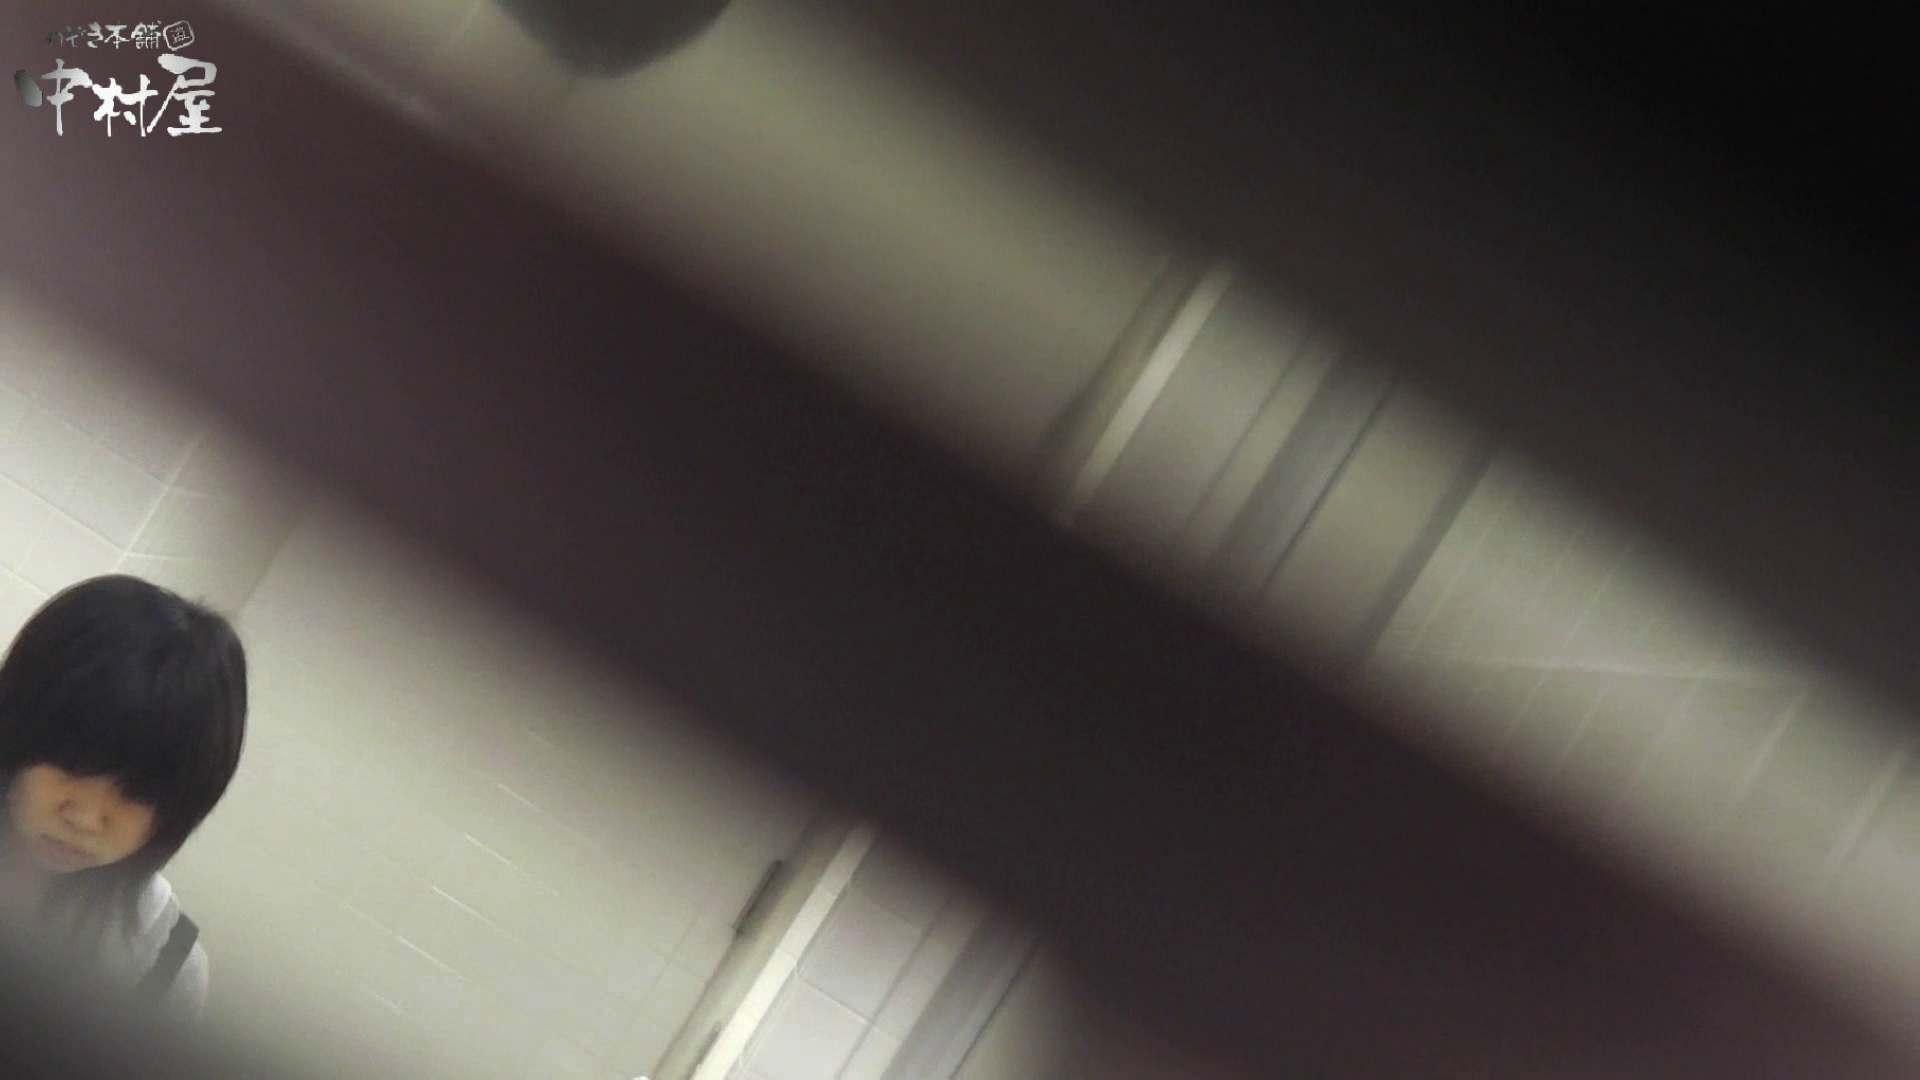 vol.54 命がけ潜伏洗面所! ヲリモノとろりん後編 プライベート  109連発 96